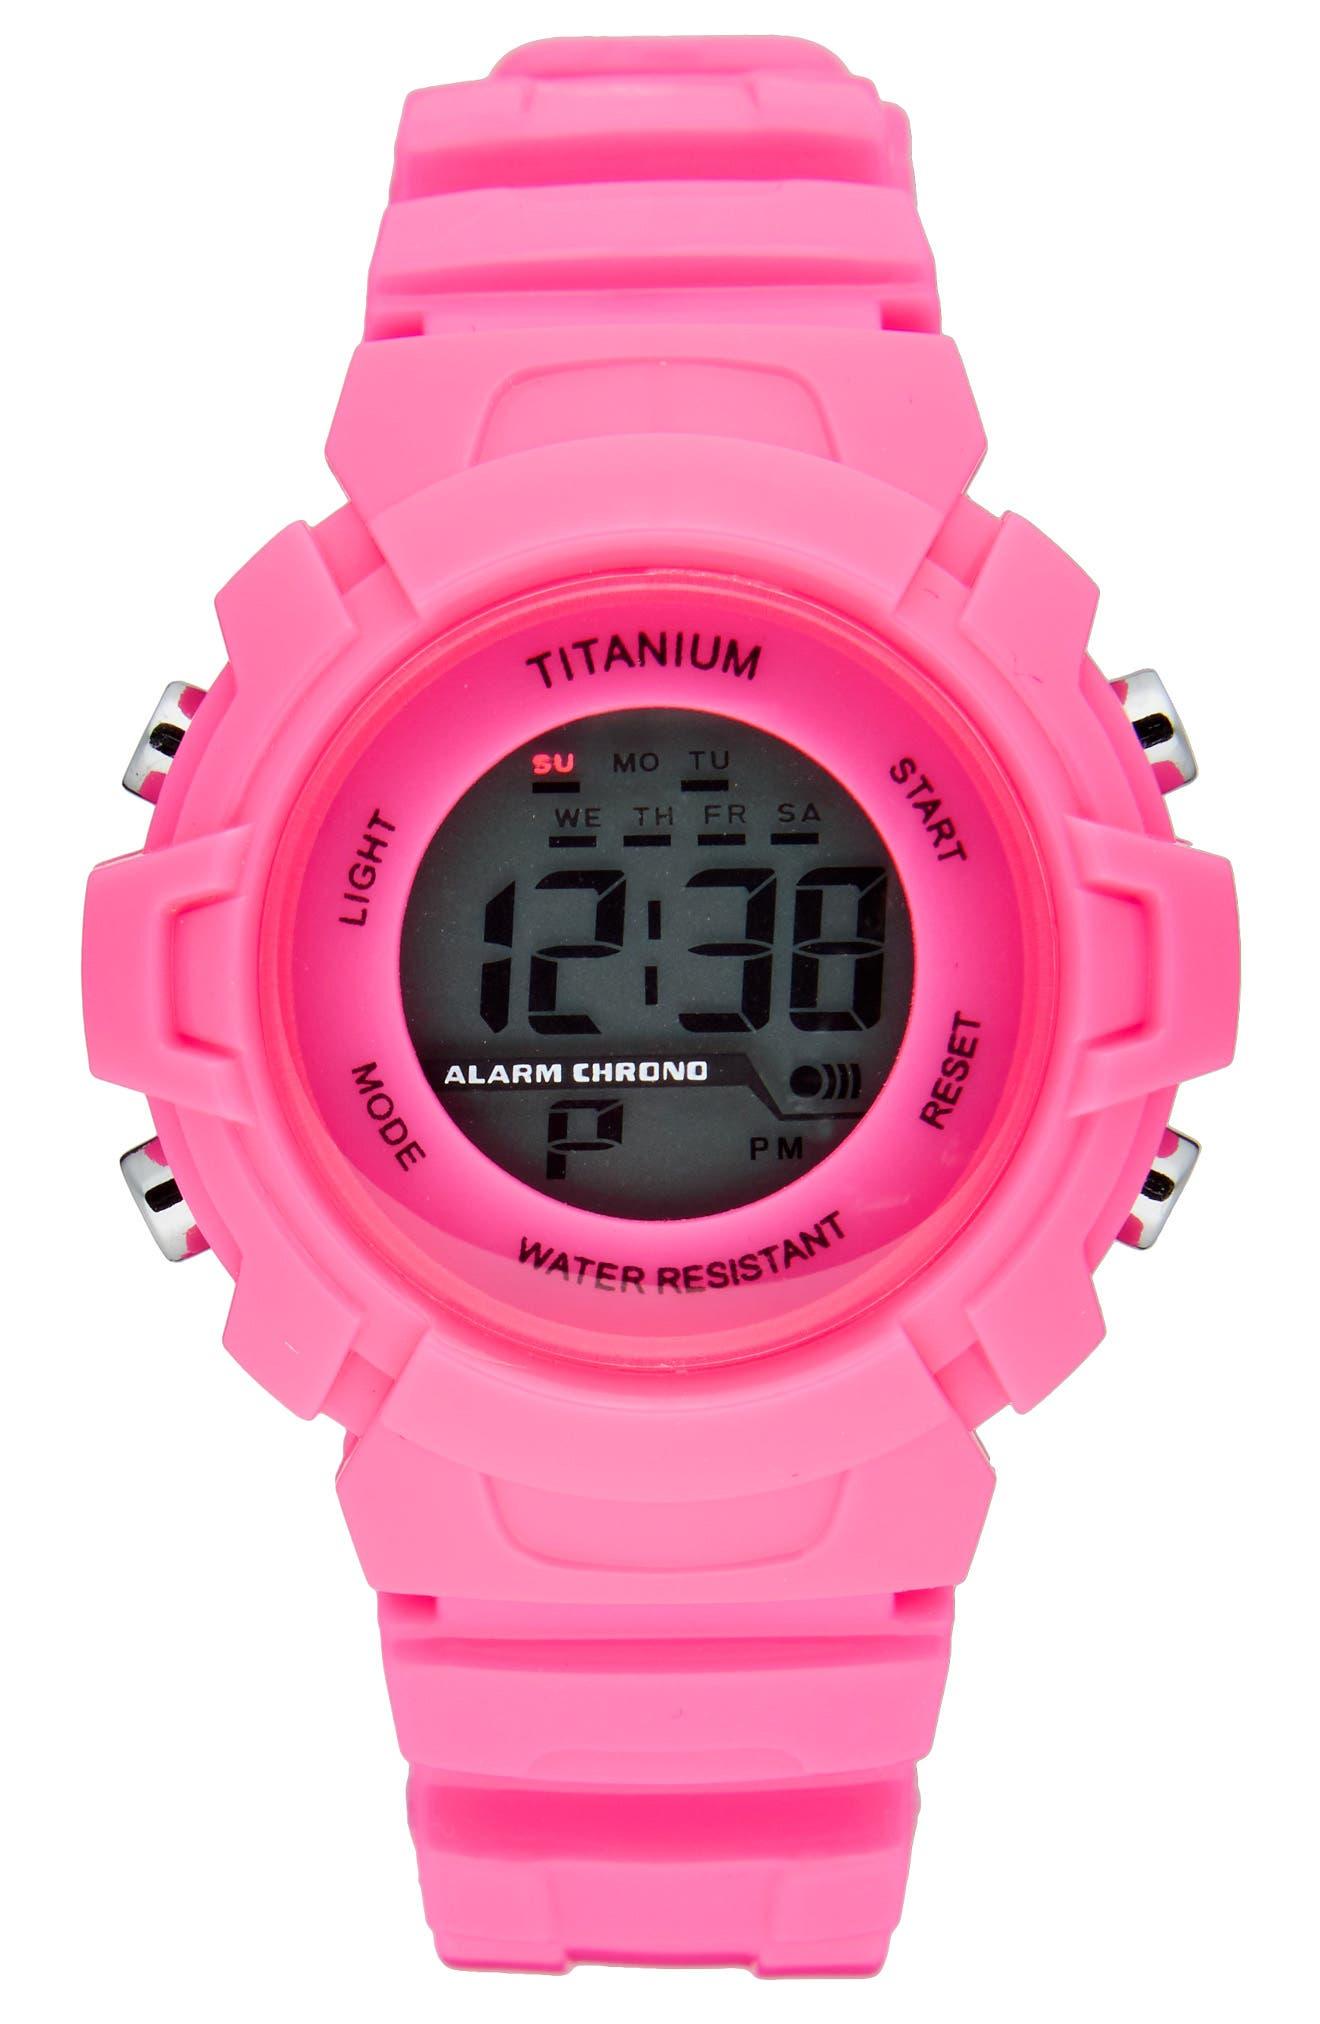 Titanium LCD Waterproof Sport Watch (Kids)